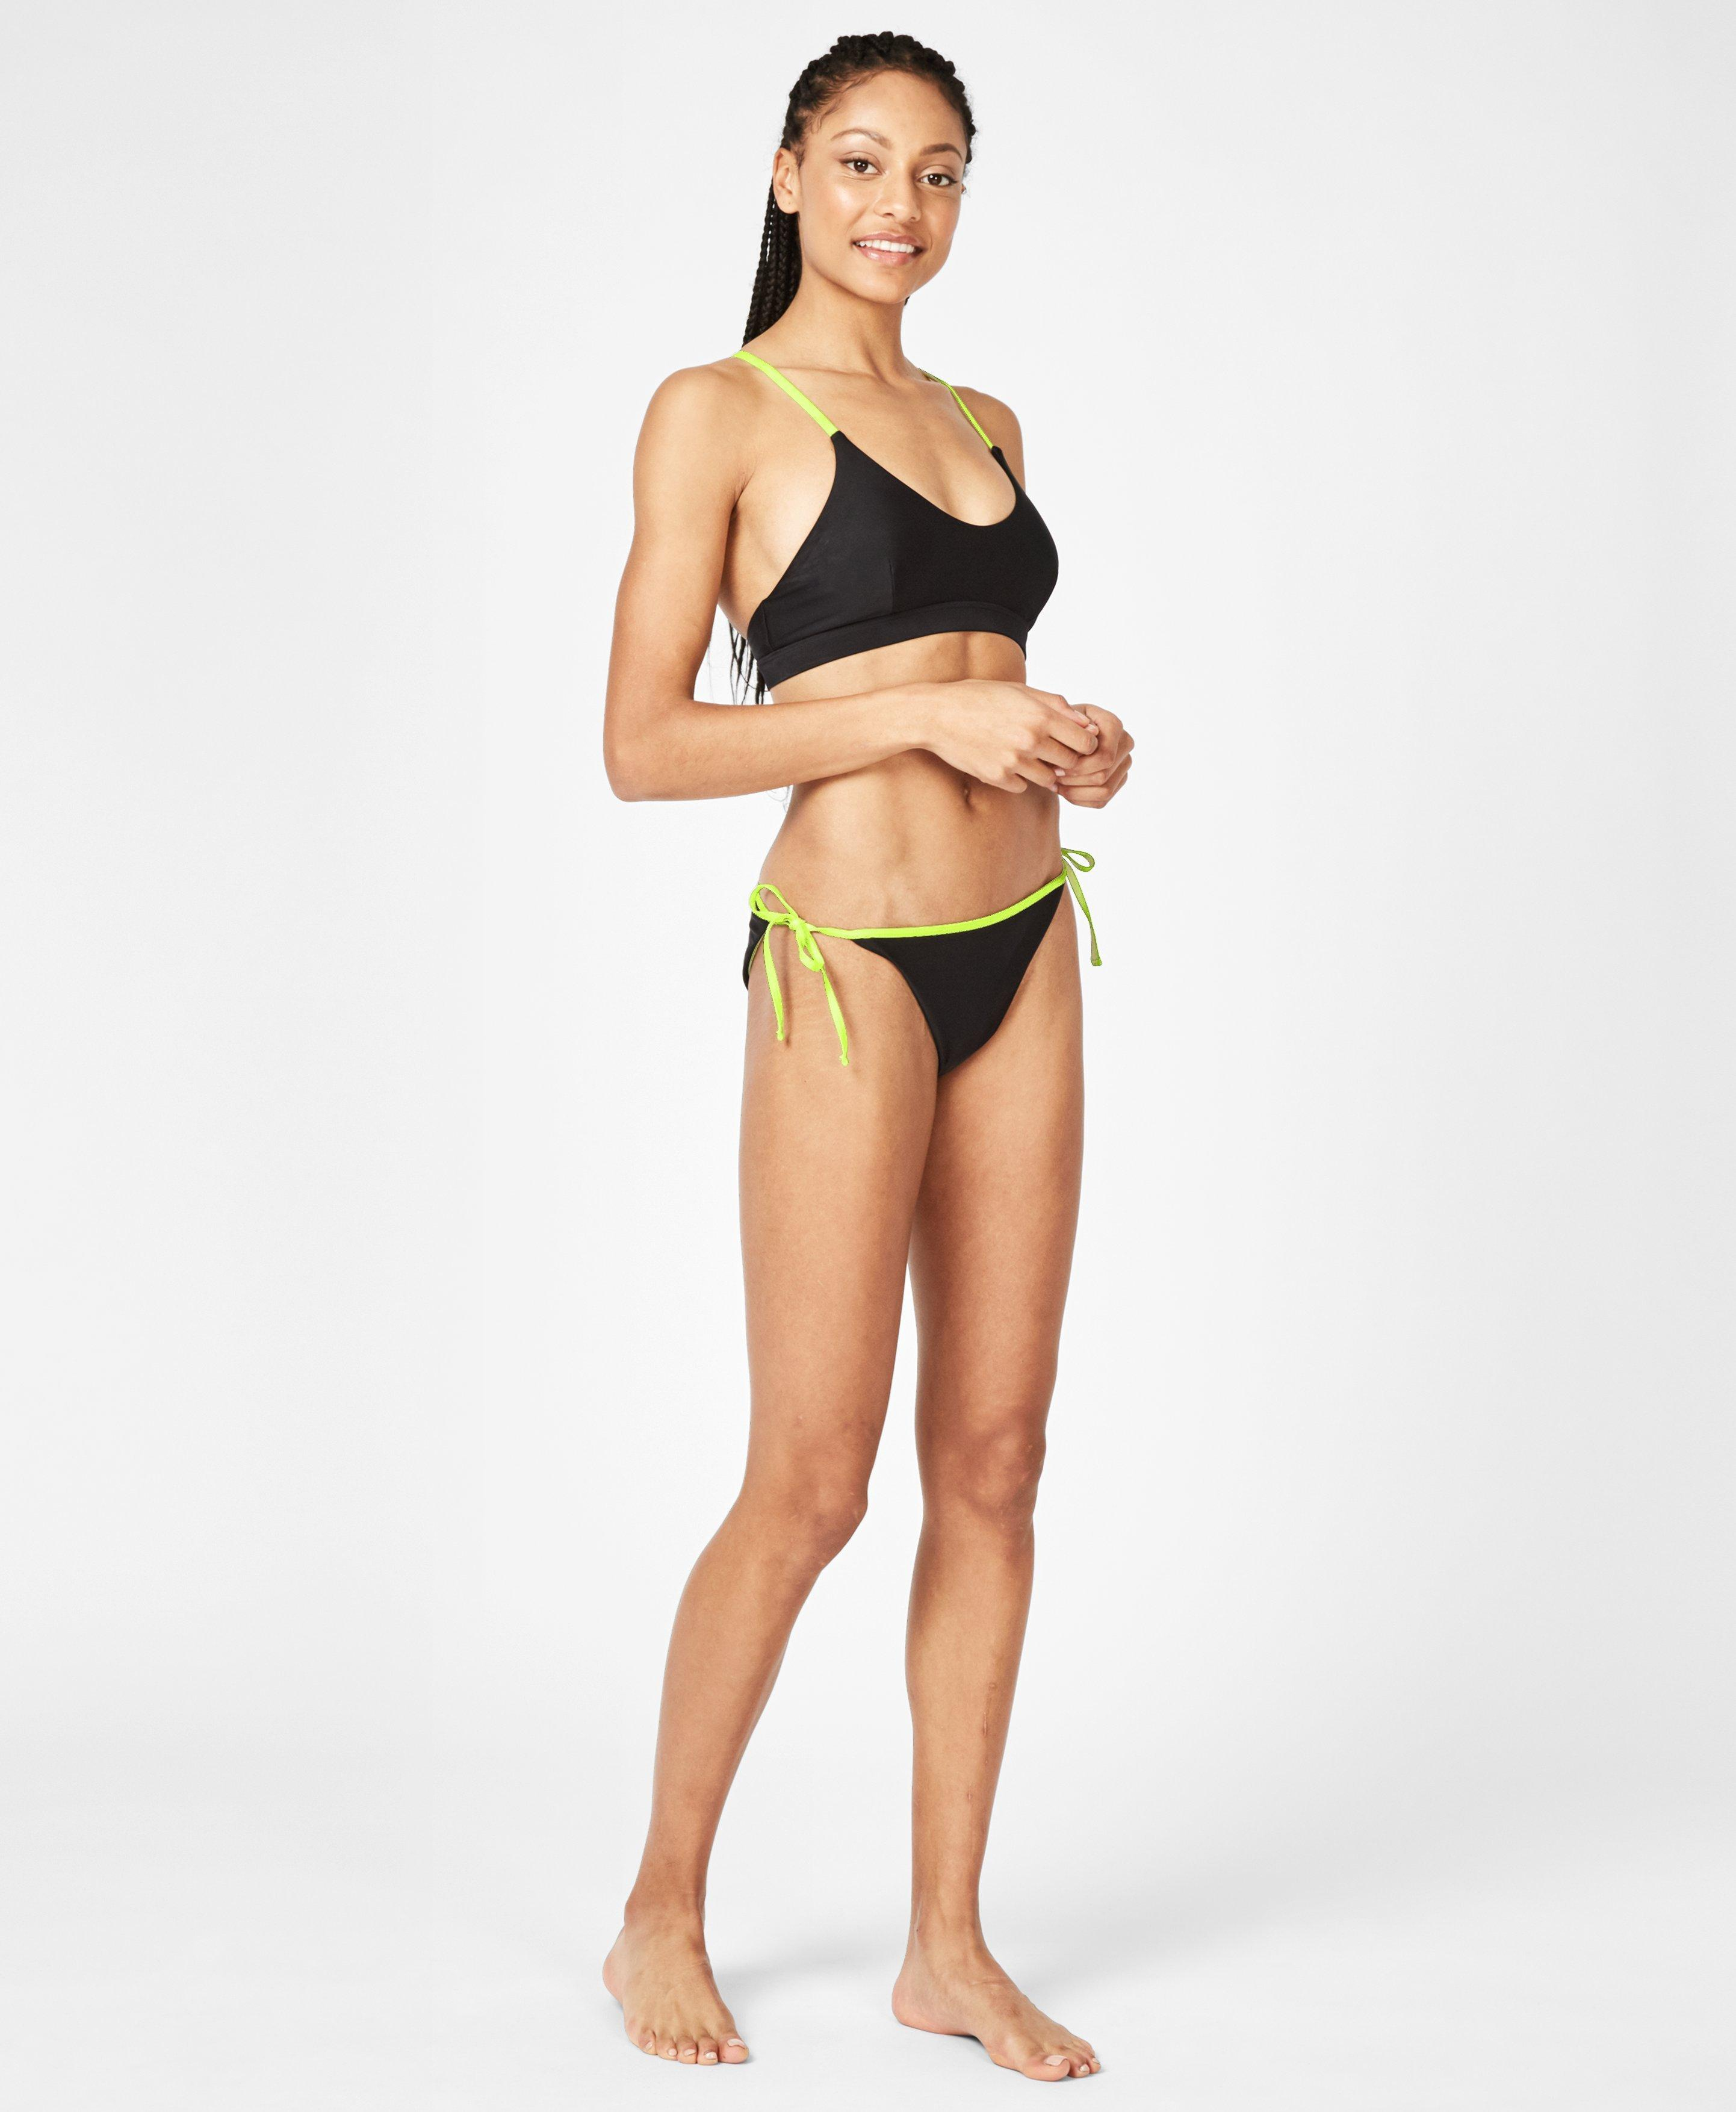 Lagoon Black Neon Bikini Set,  | Sweaty Betty